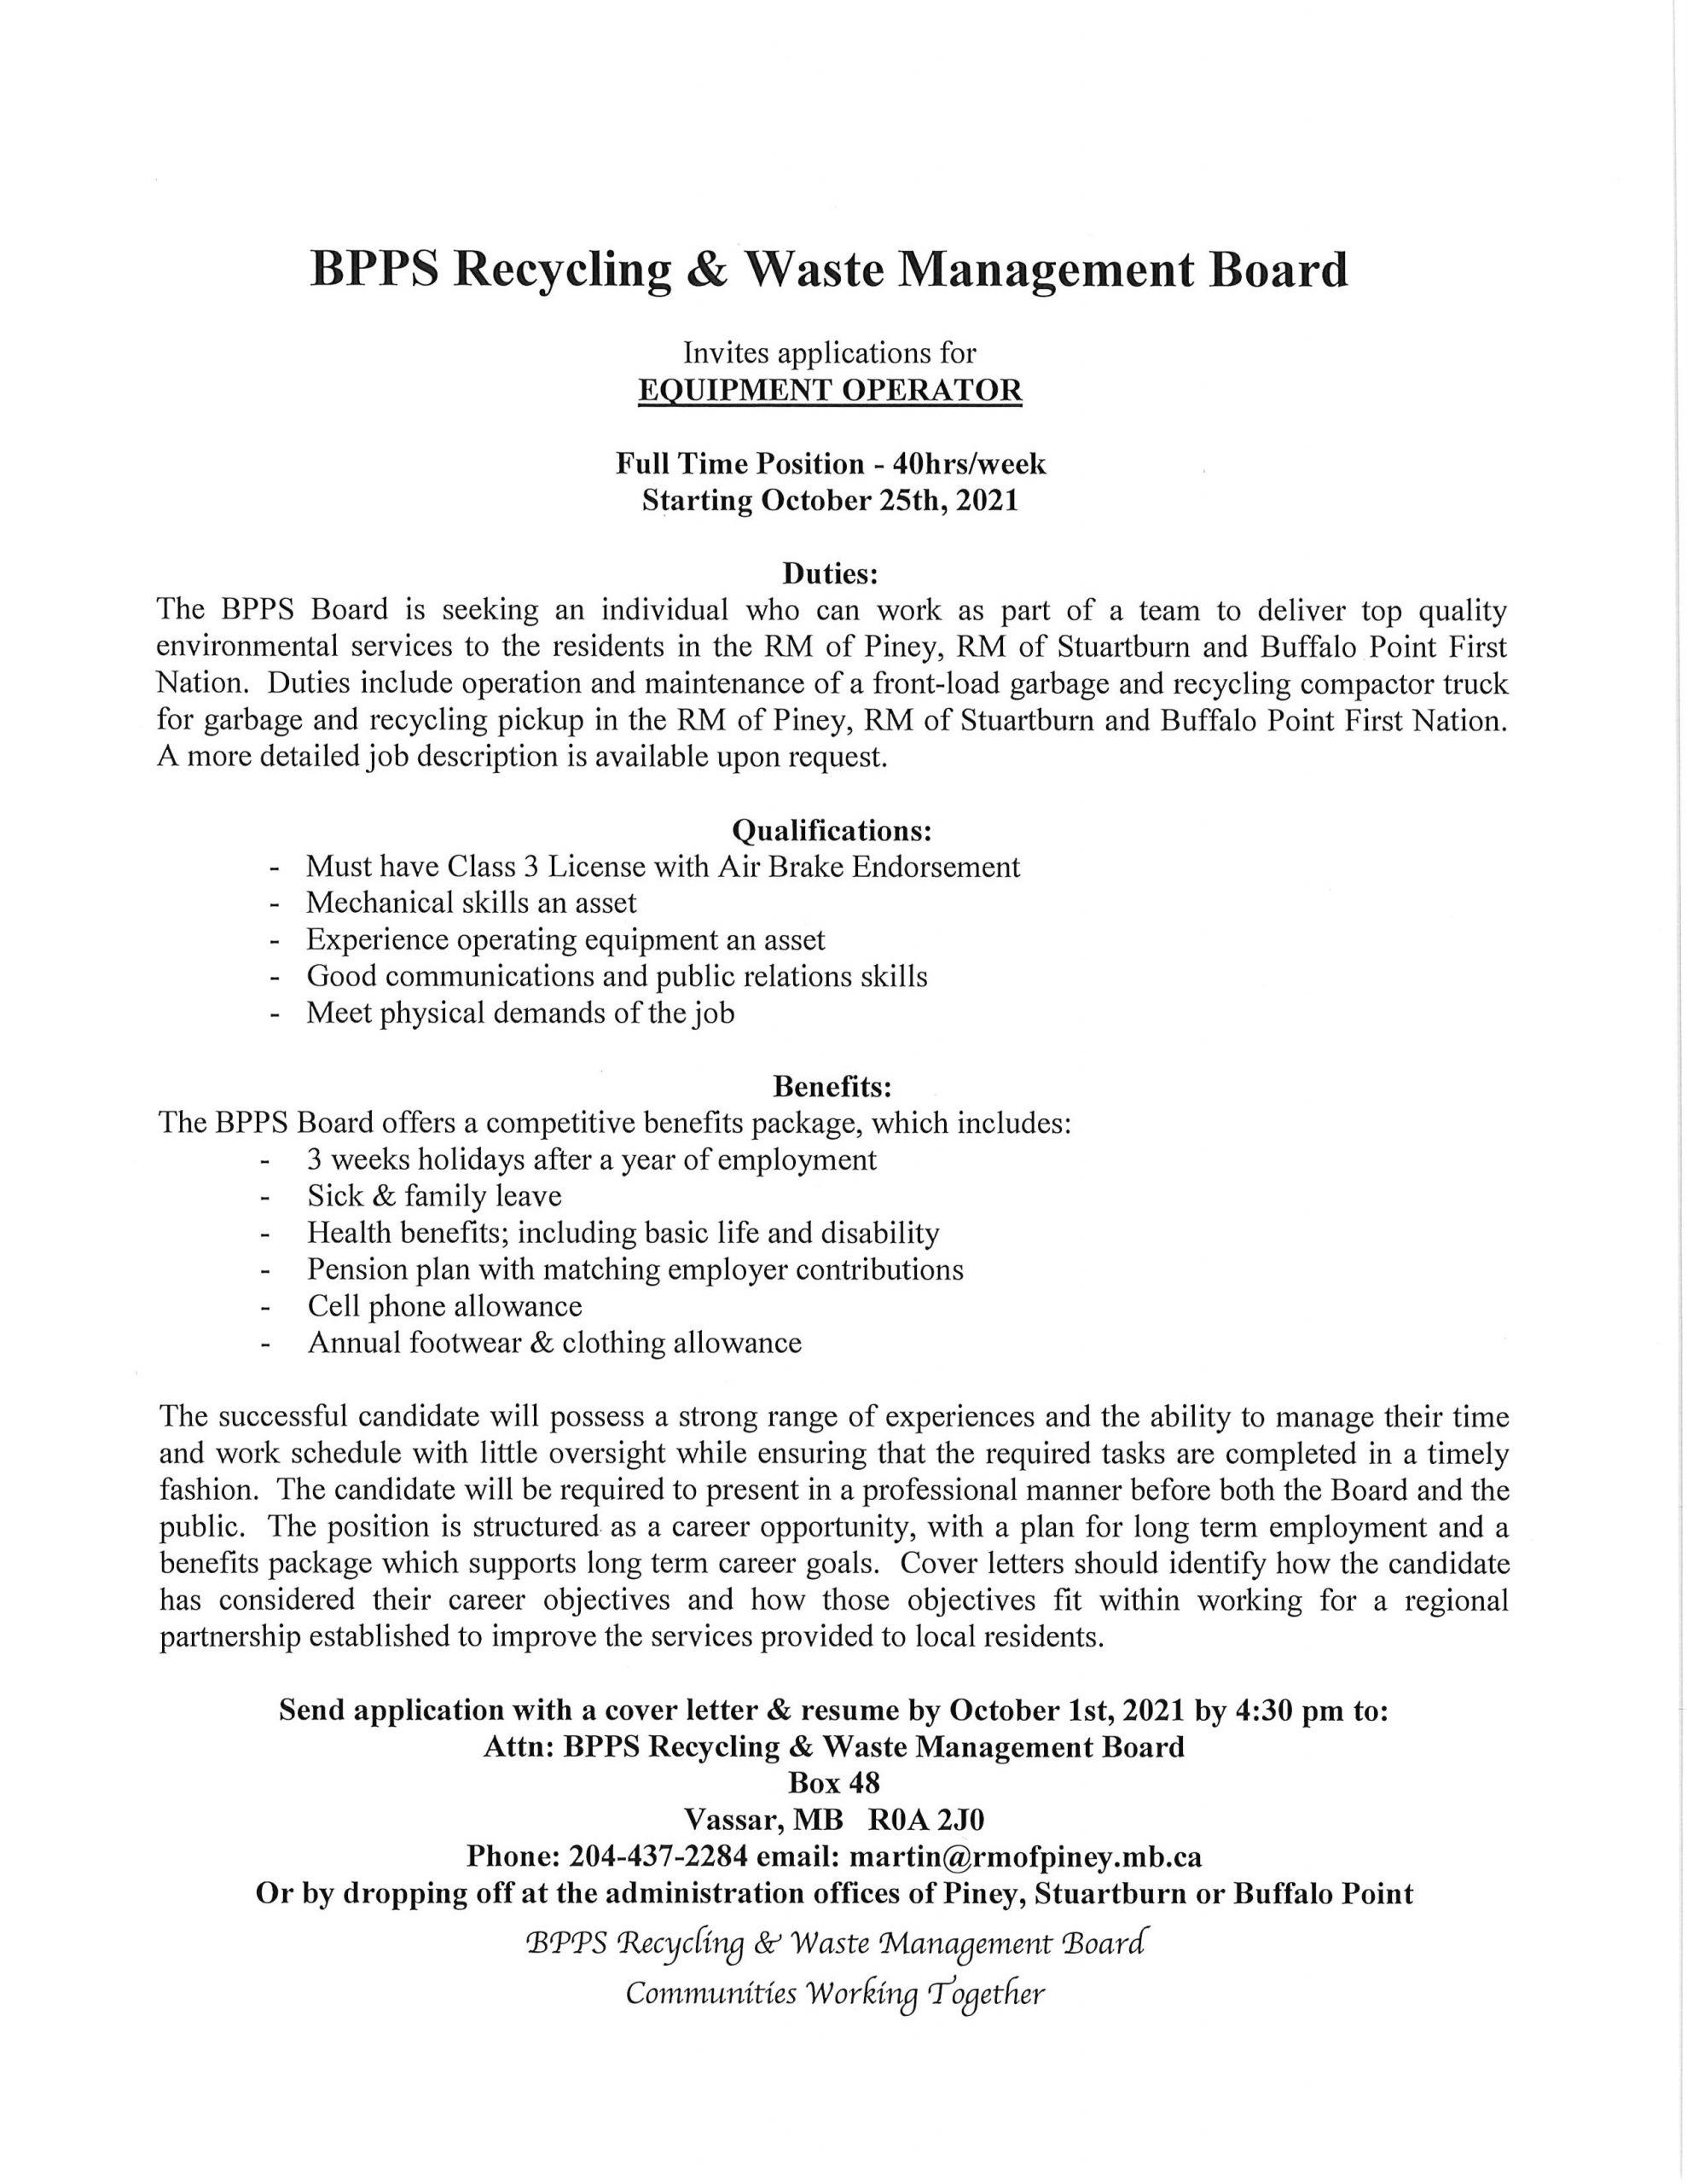 Job Posting for Equipment Operator Oct 1 2021